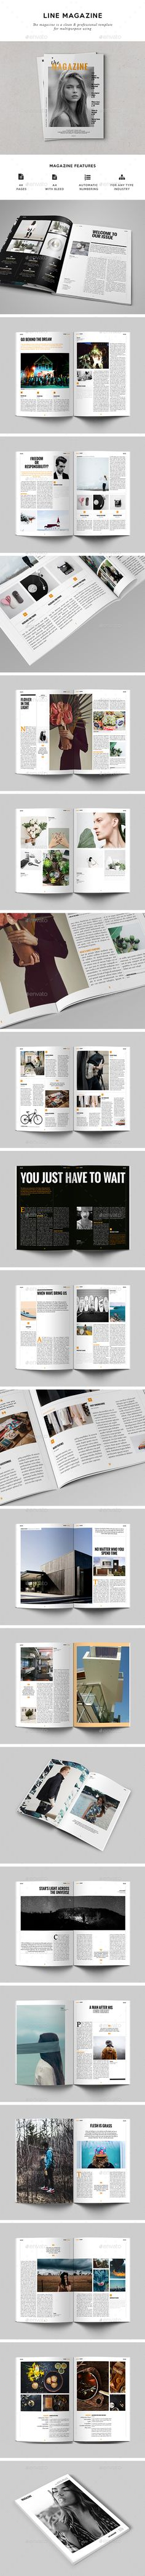 Line Magazine Template InDesign INDD. Download here: http://graphicriver.net/item/line-magazine/15888140?ref=ksioks